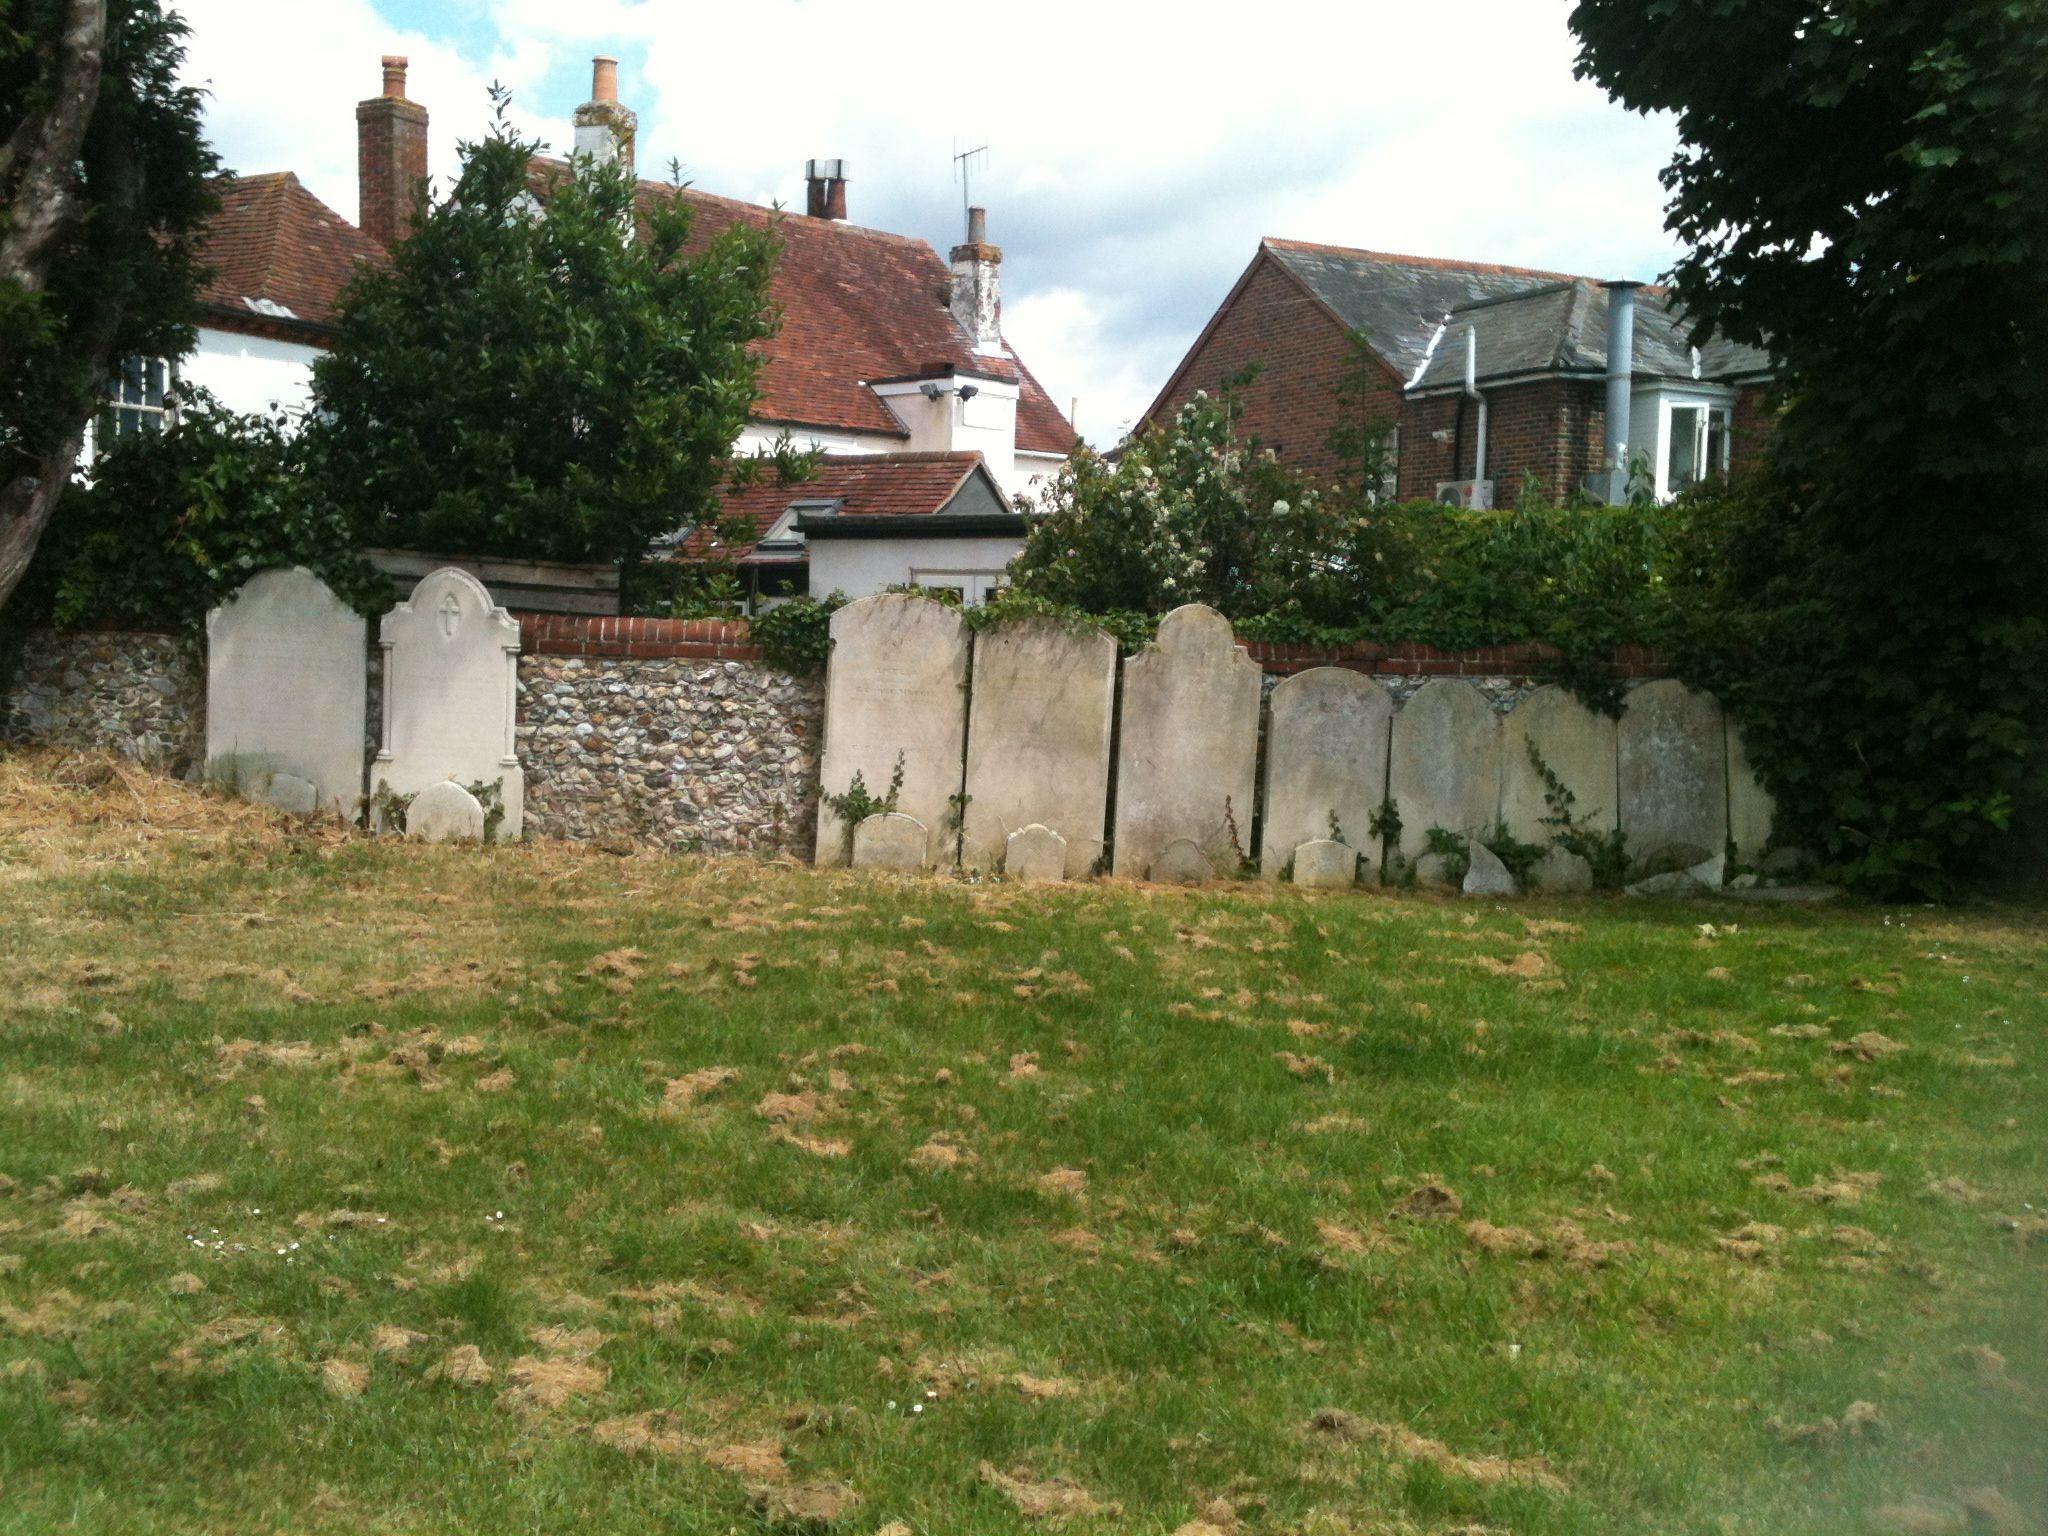 Ensworth churchyard hampshire